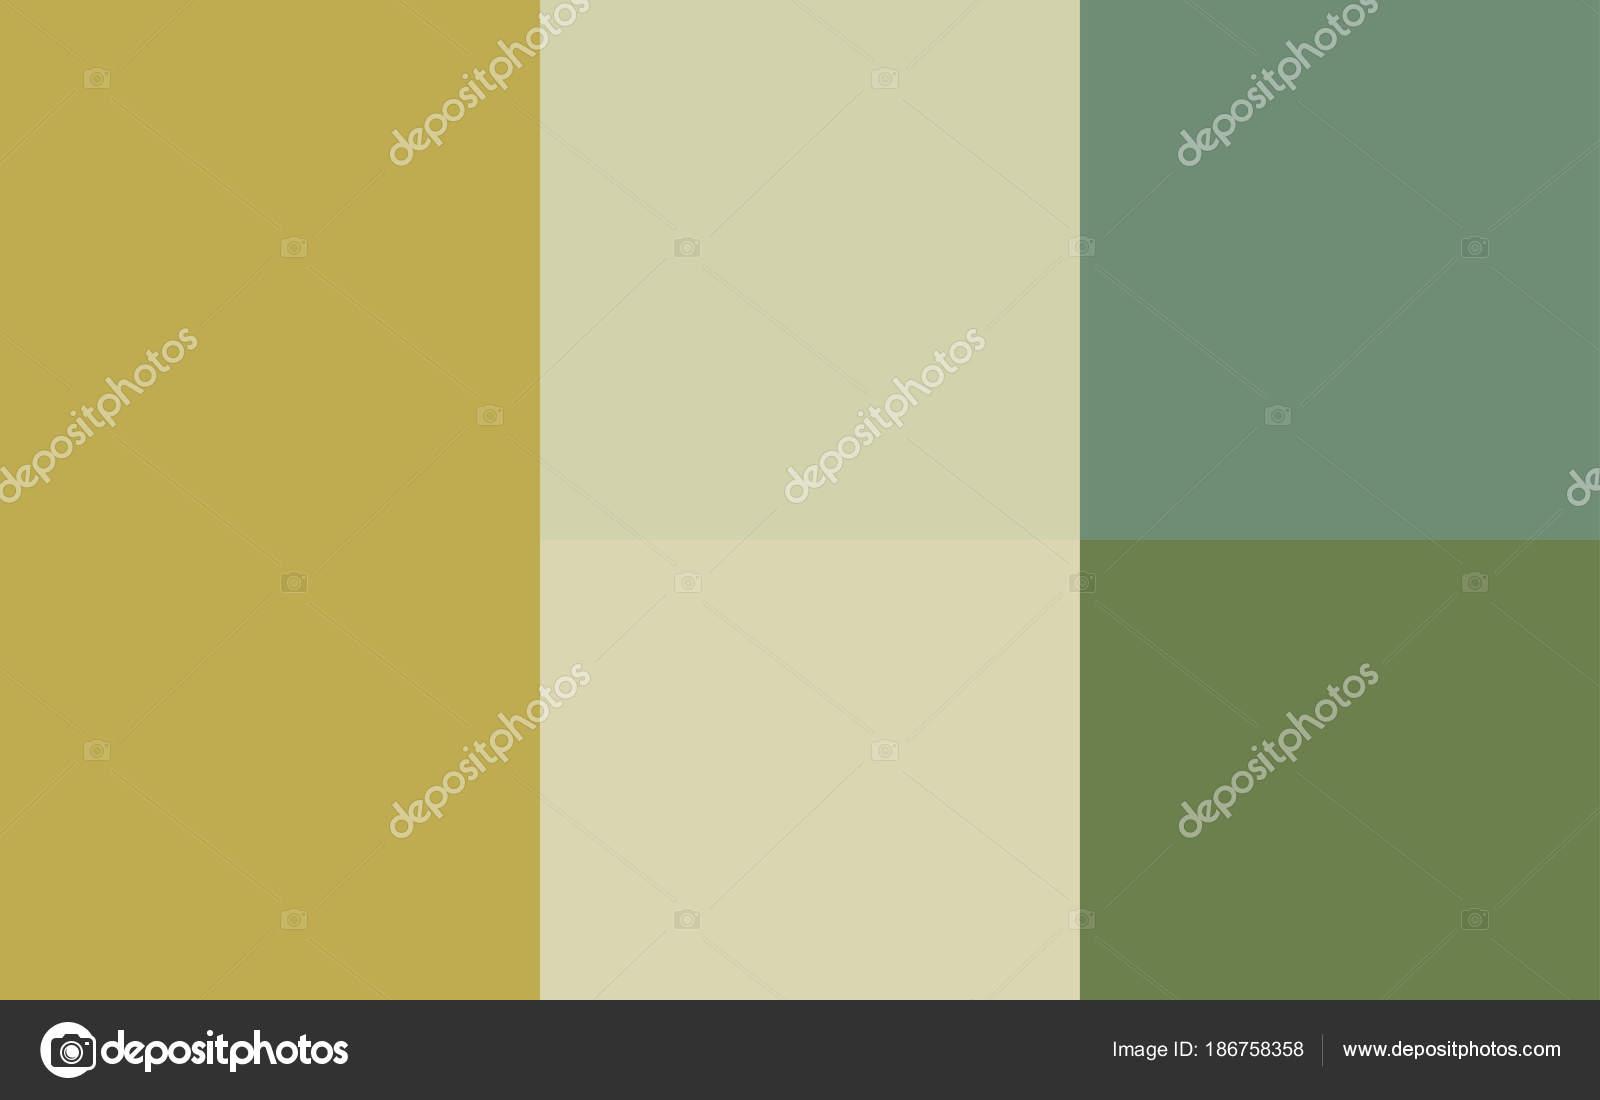 Vert Clair Fond Jaune Vector Avec Palette Lumineuse Image